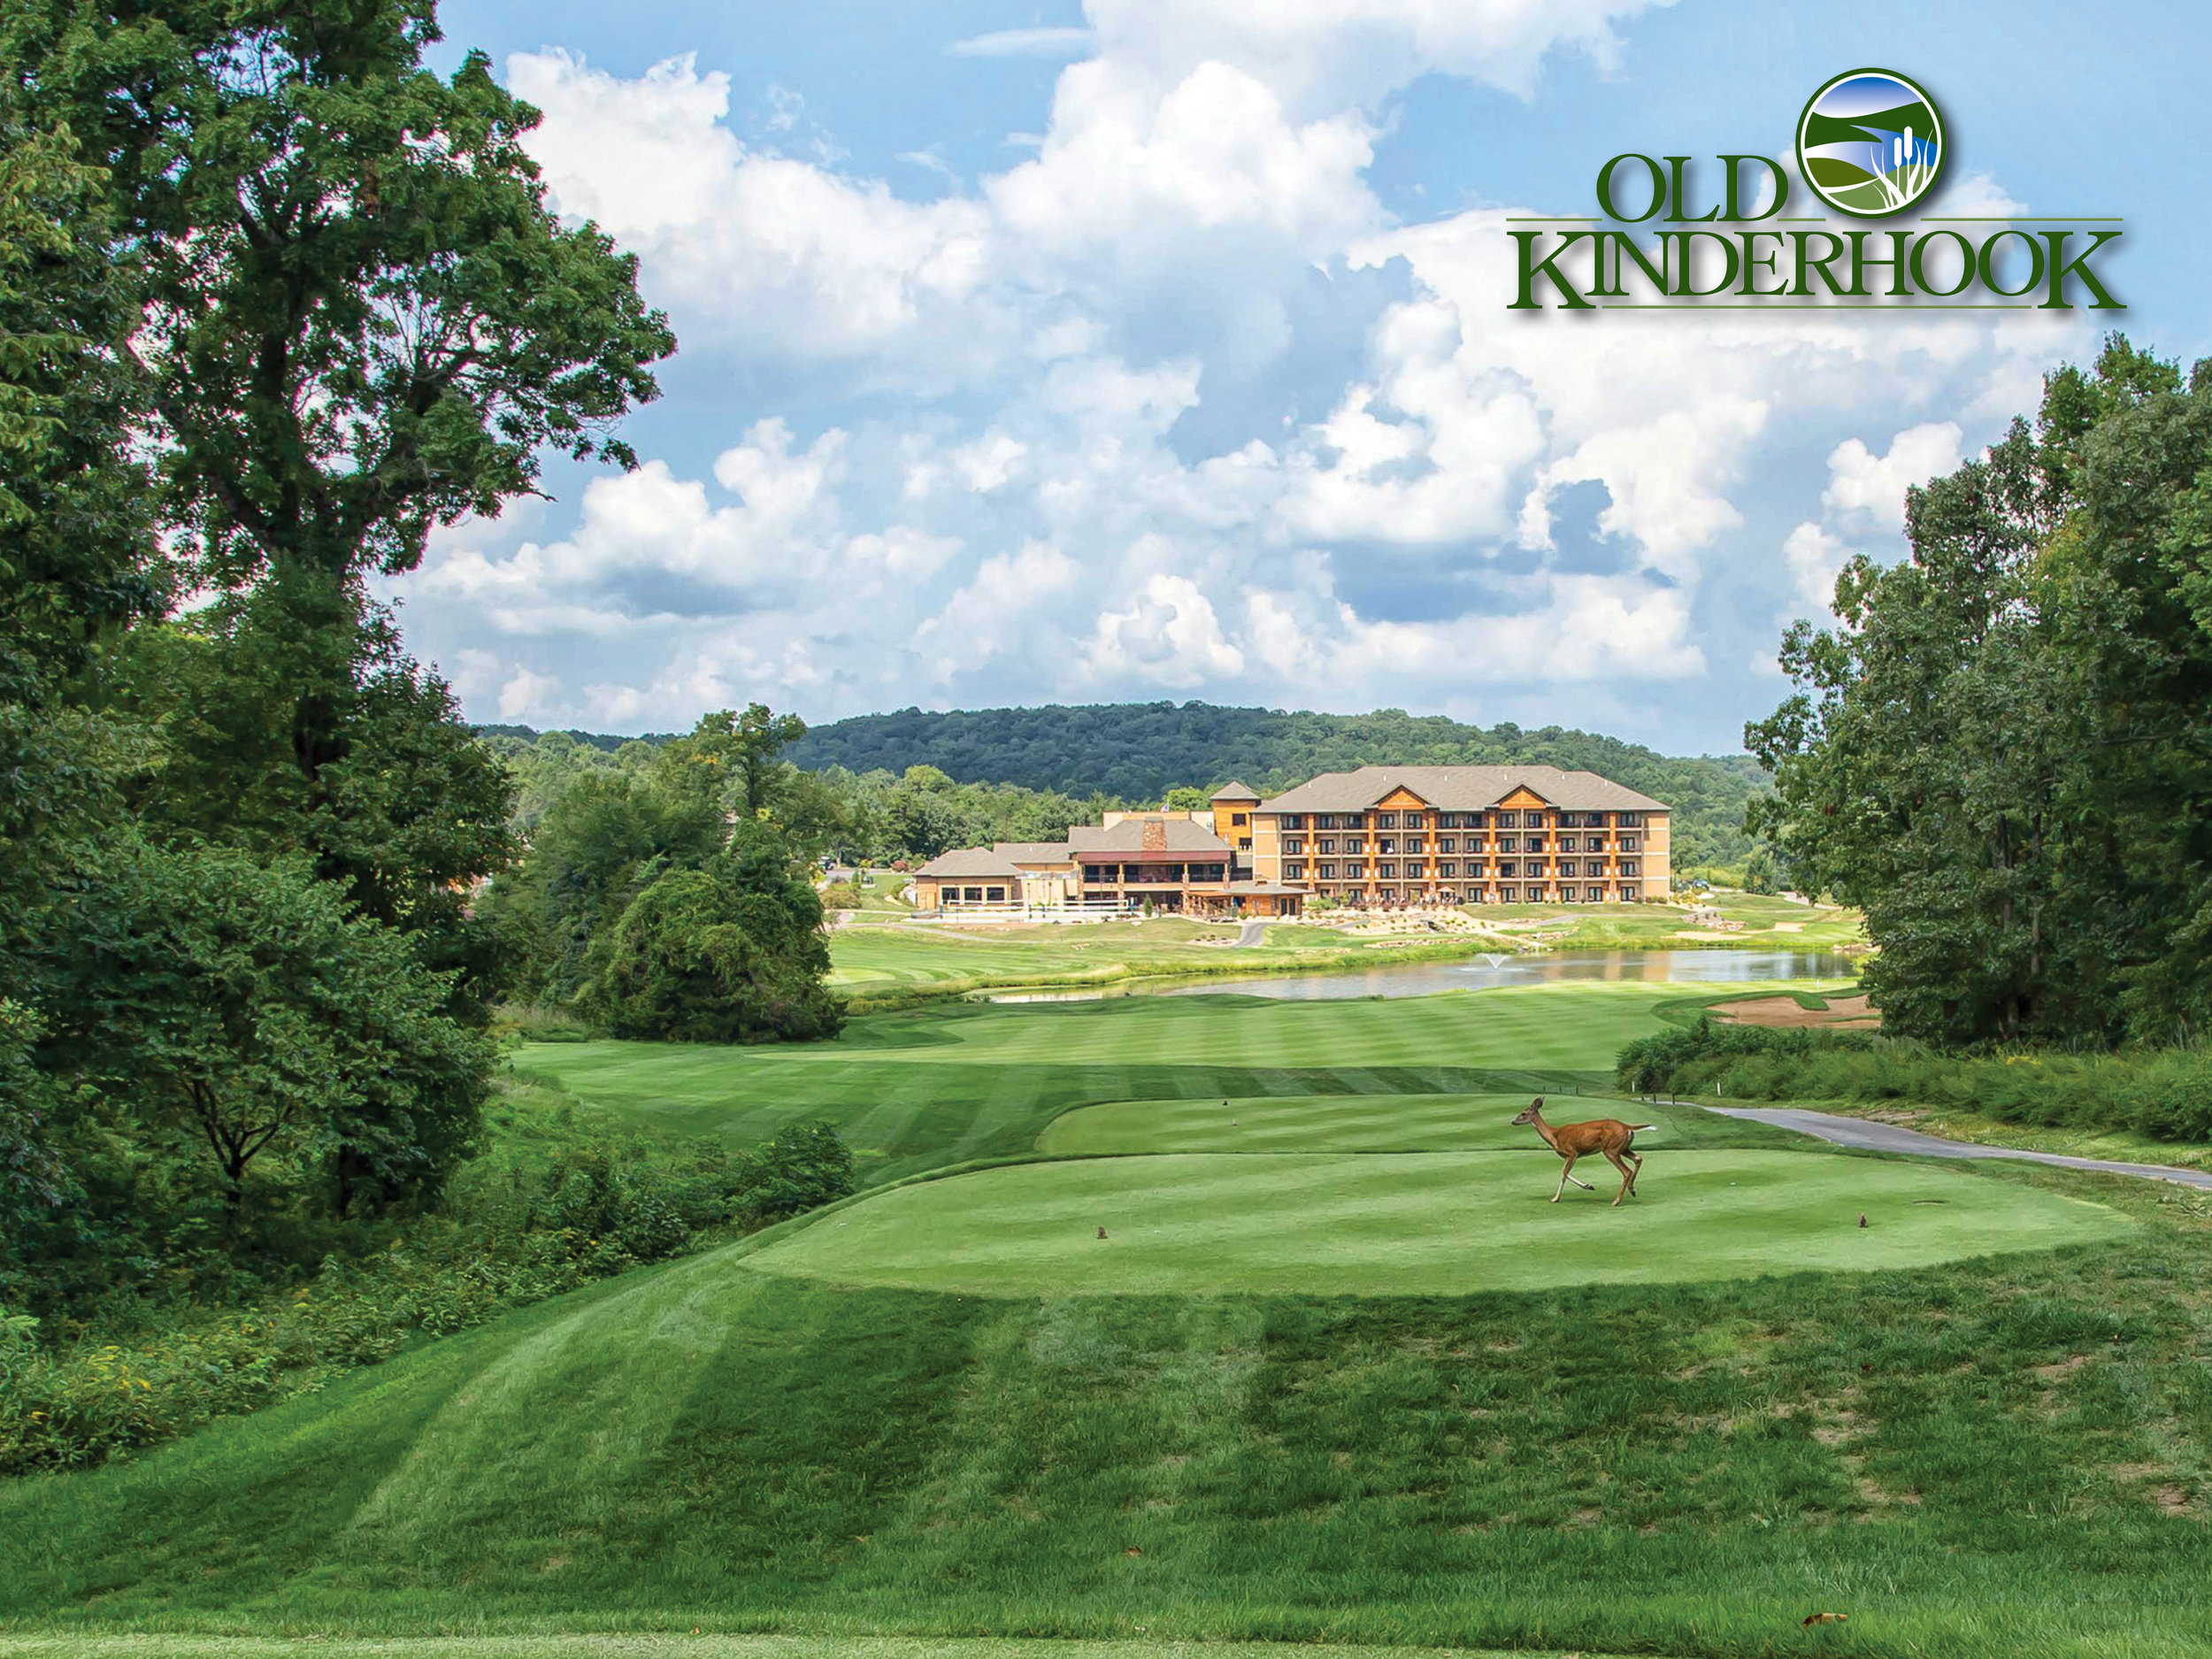 CAmdenton, MO | #2 Ranked course in Missouri - OLD KINDERHOOKSunday, JULY 14th$125